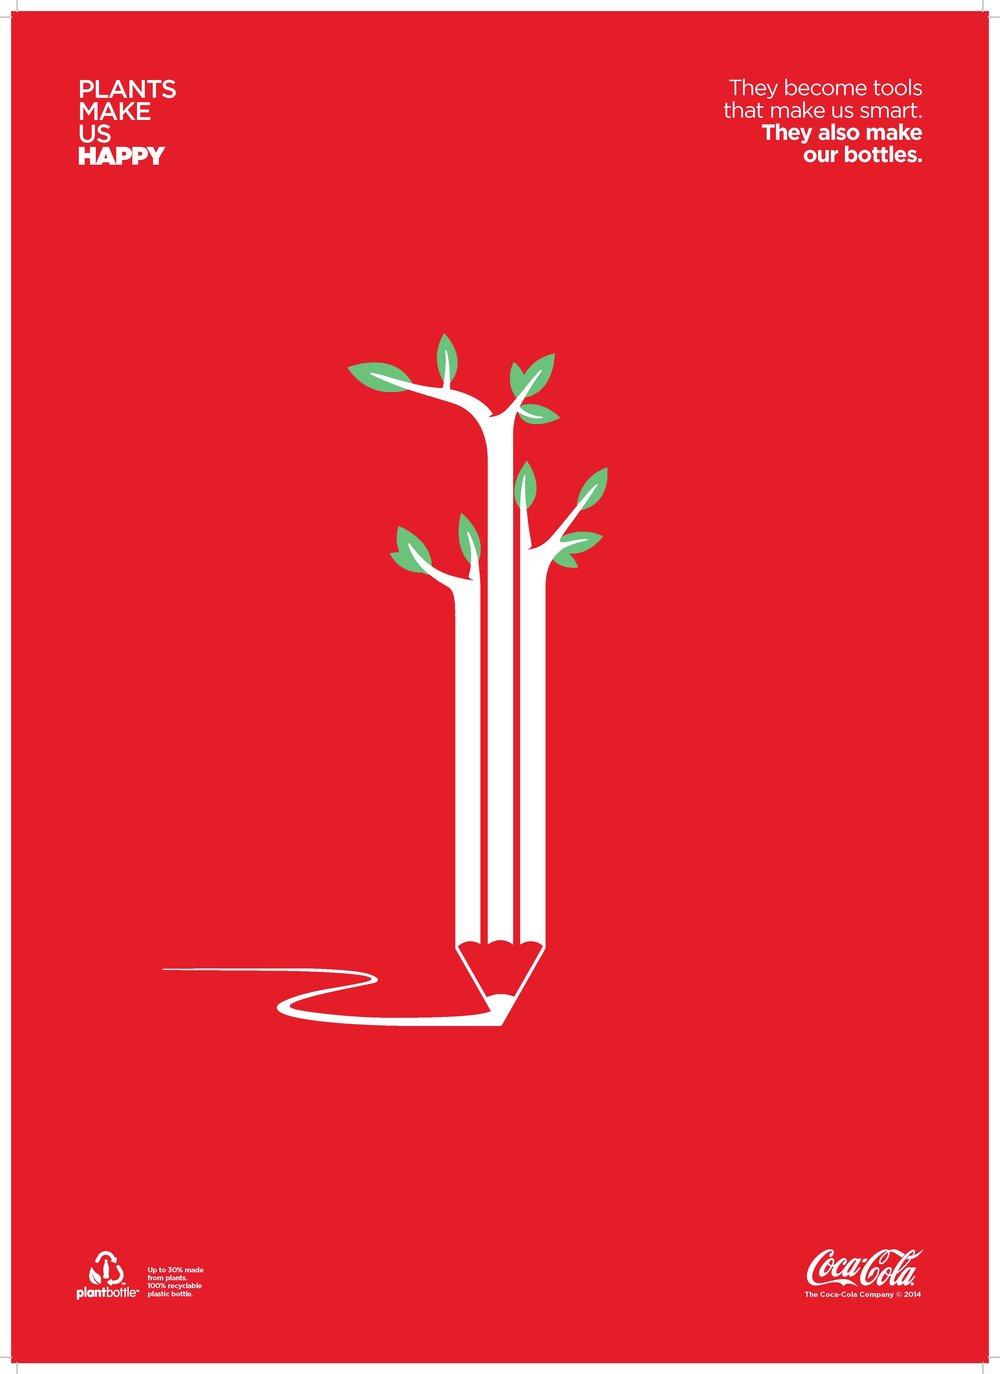 plantbottle2.jpg